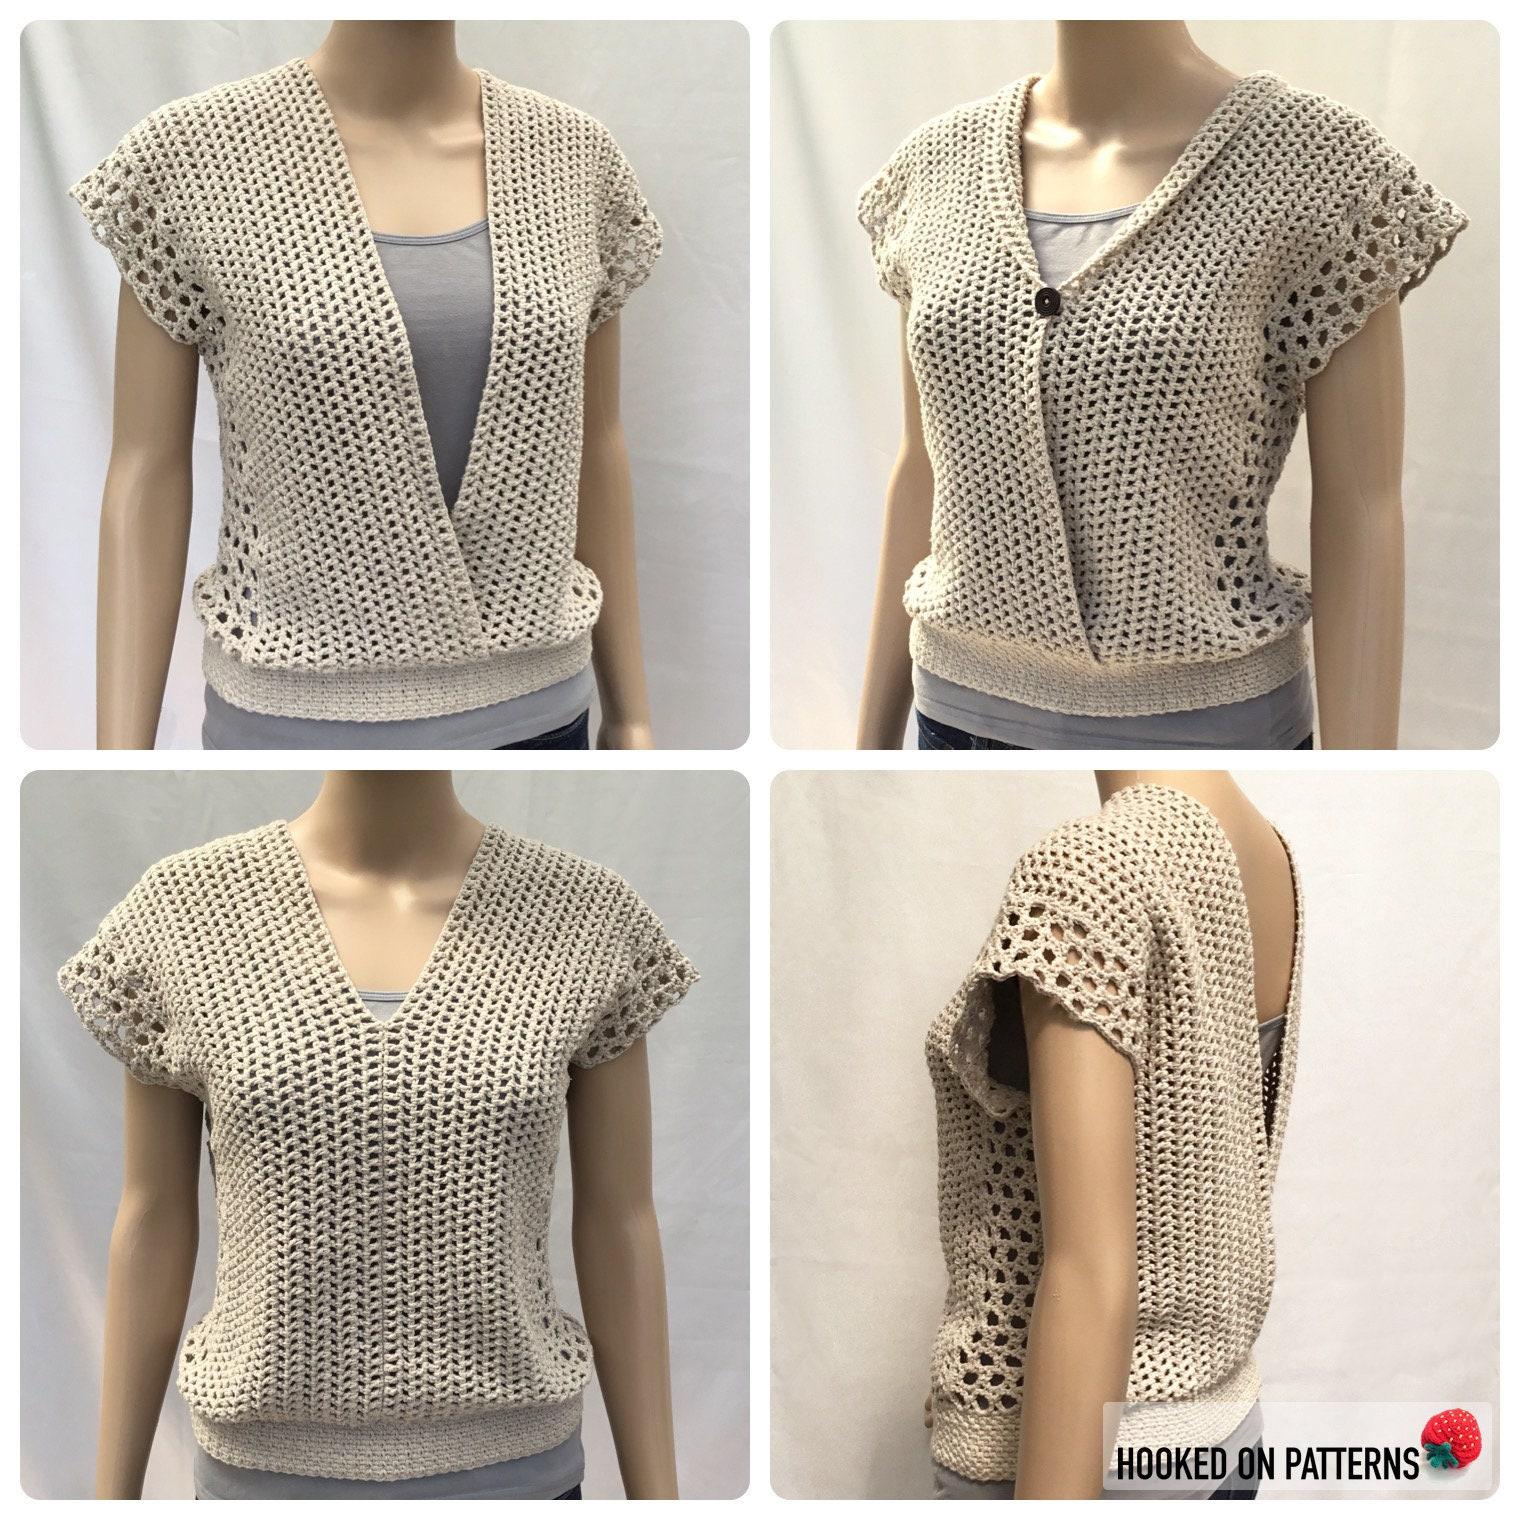 2d8016a9f5 Leora Summer Top Crochet Pattern PDF Download Sizes S M